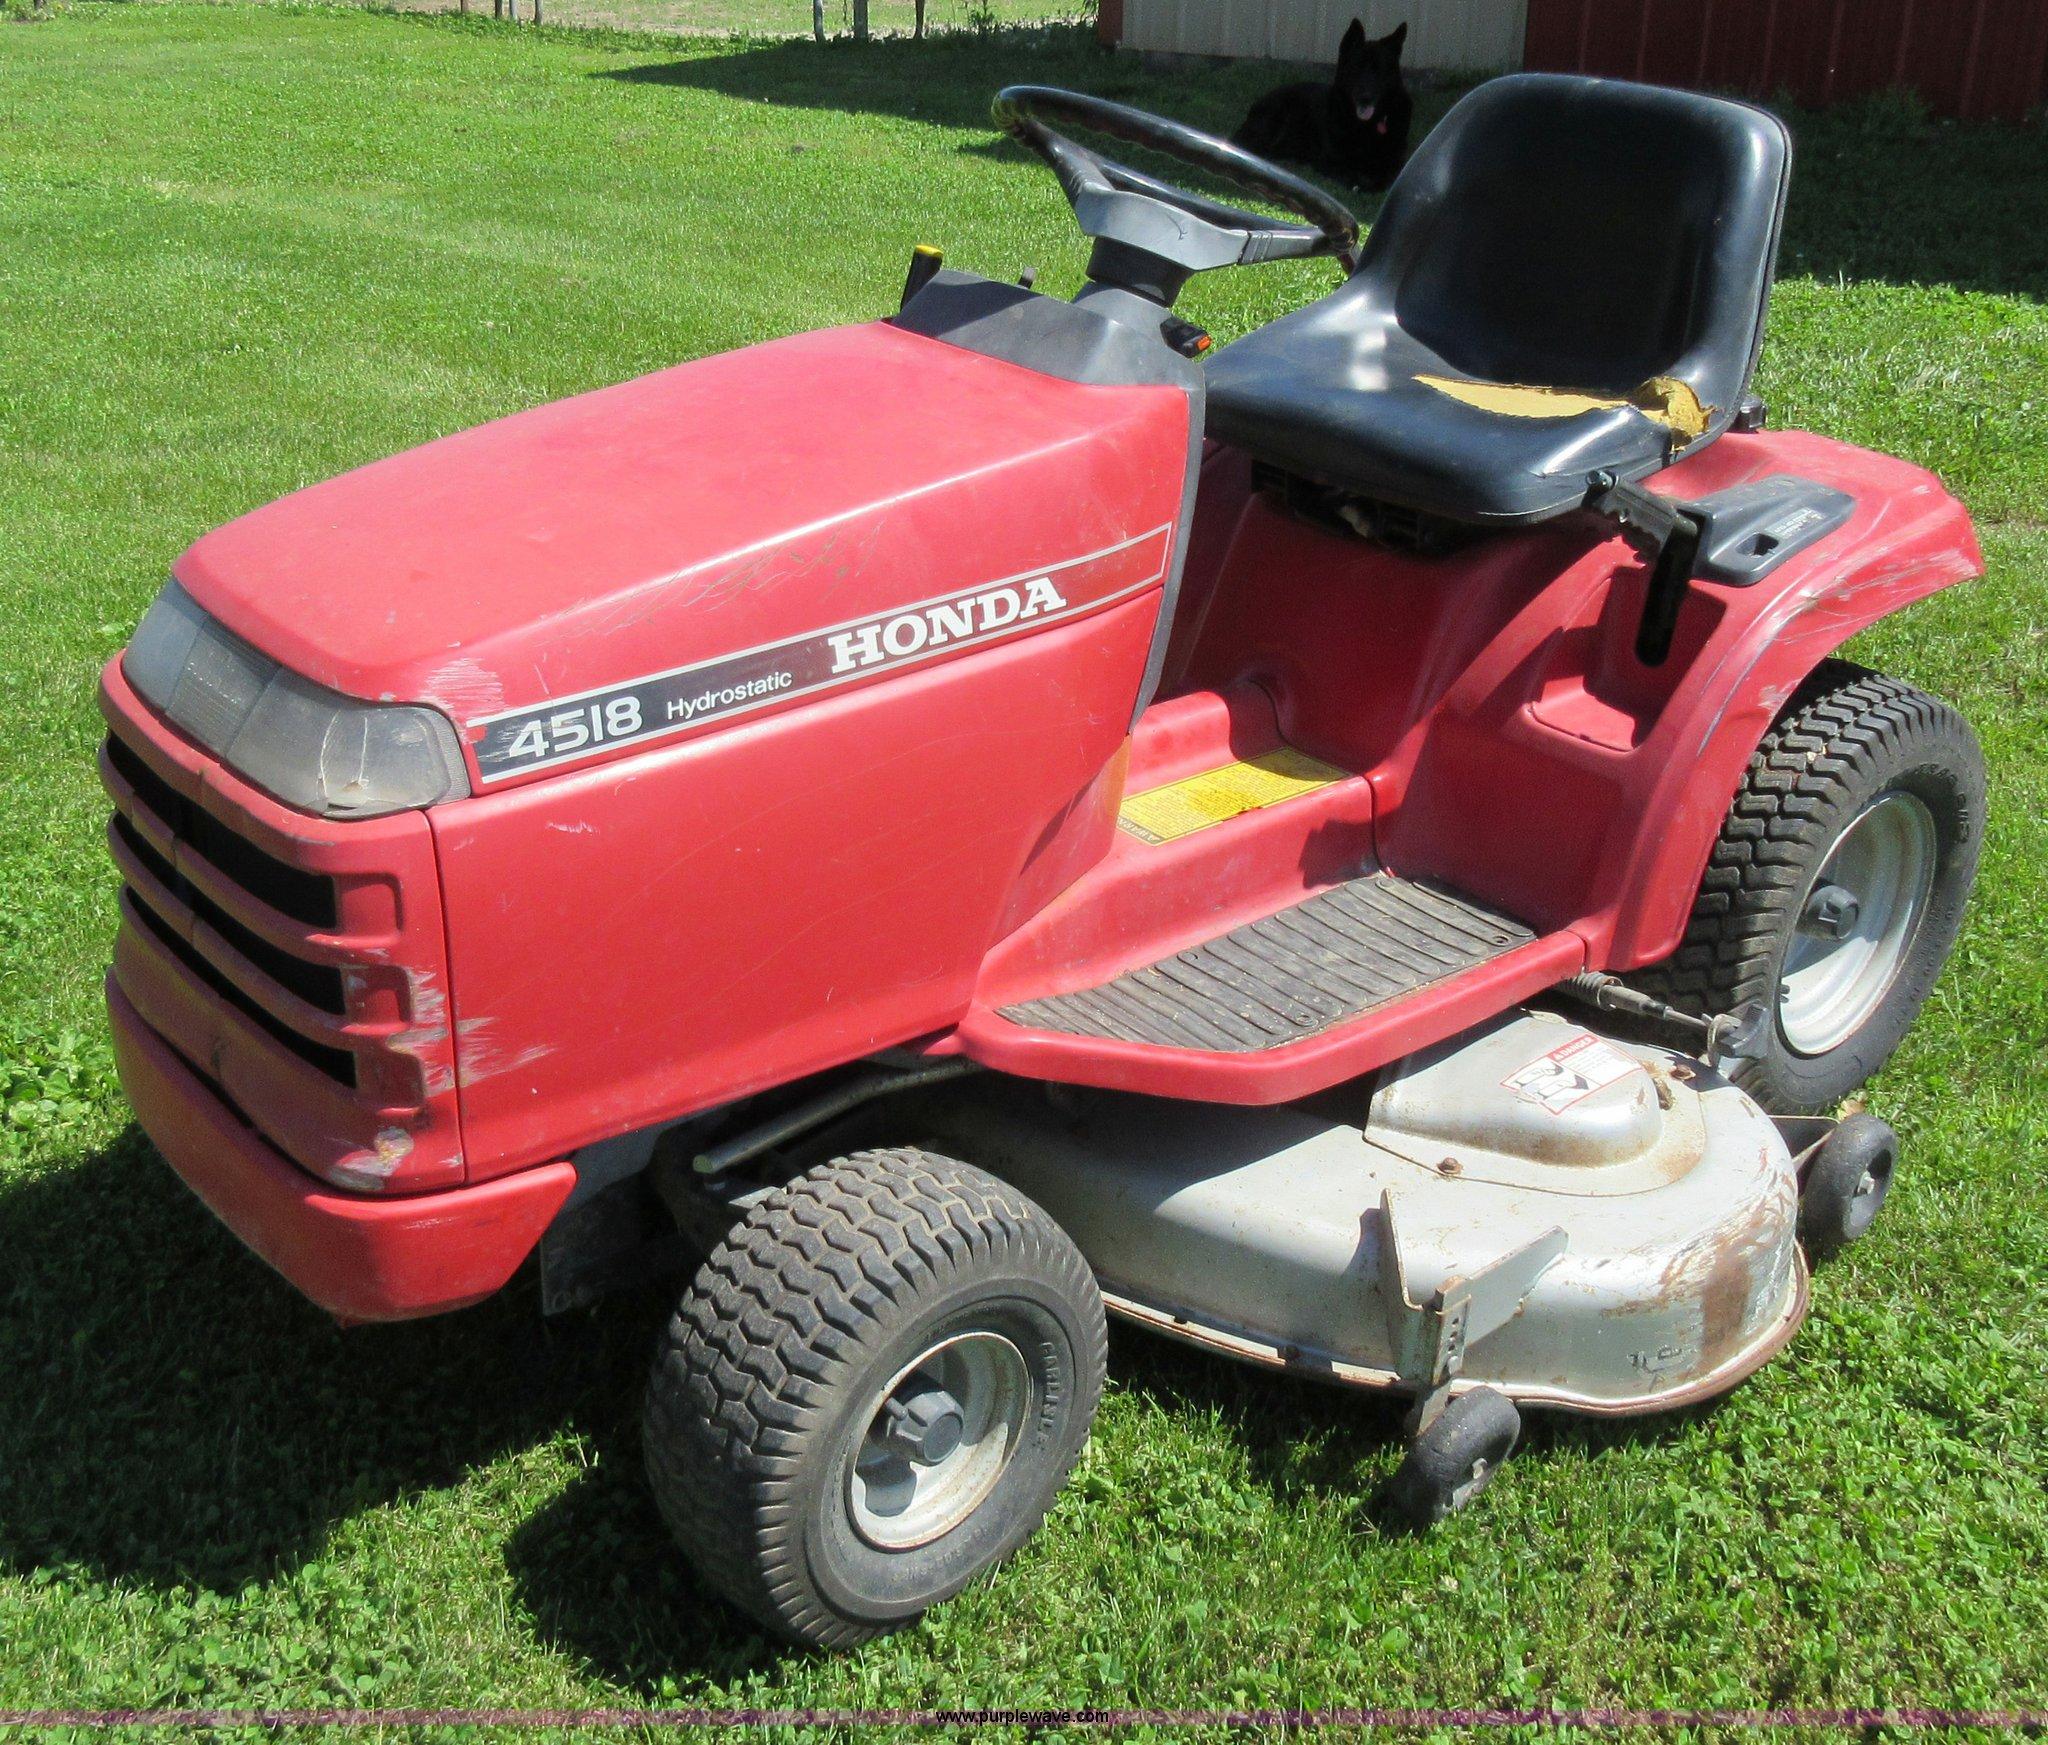 Honda H4518h 4518 Lawn Tractor Service Repair Manual Nemetas 4514 Wiring Diagram Schematic Mower Item L2783 Sold July 6 Vehicles A Rh Purplewave Com